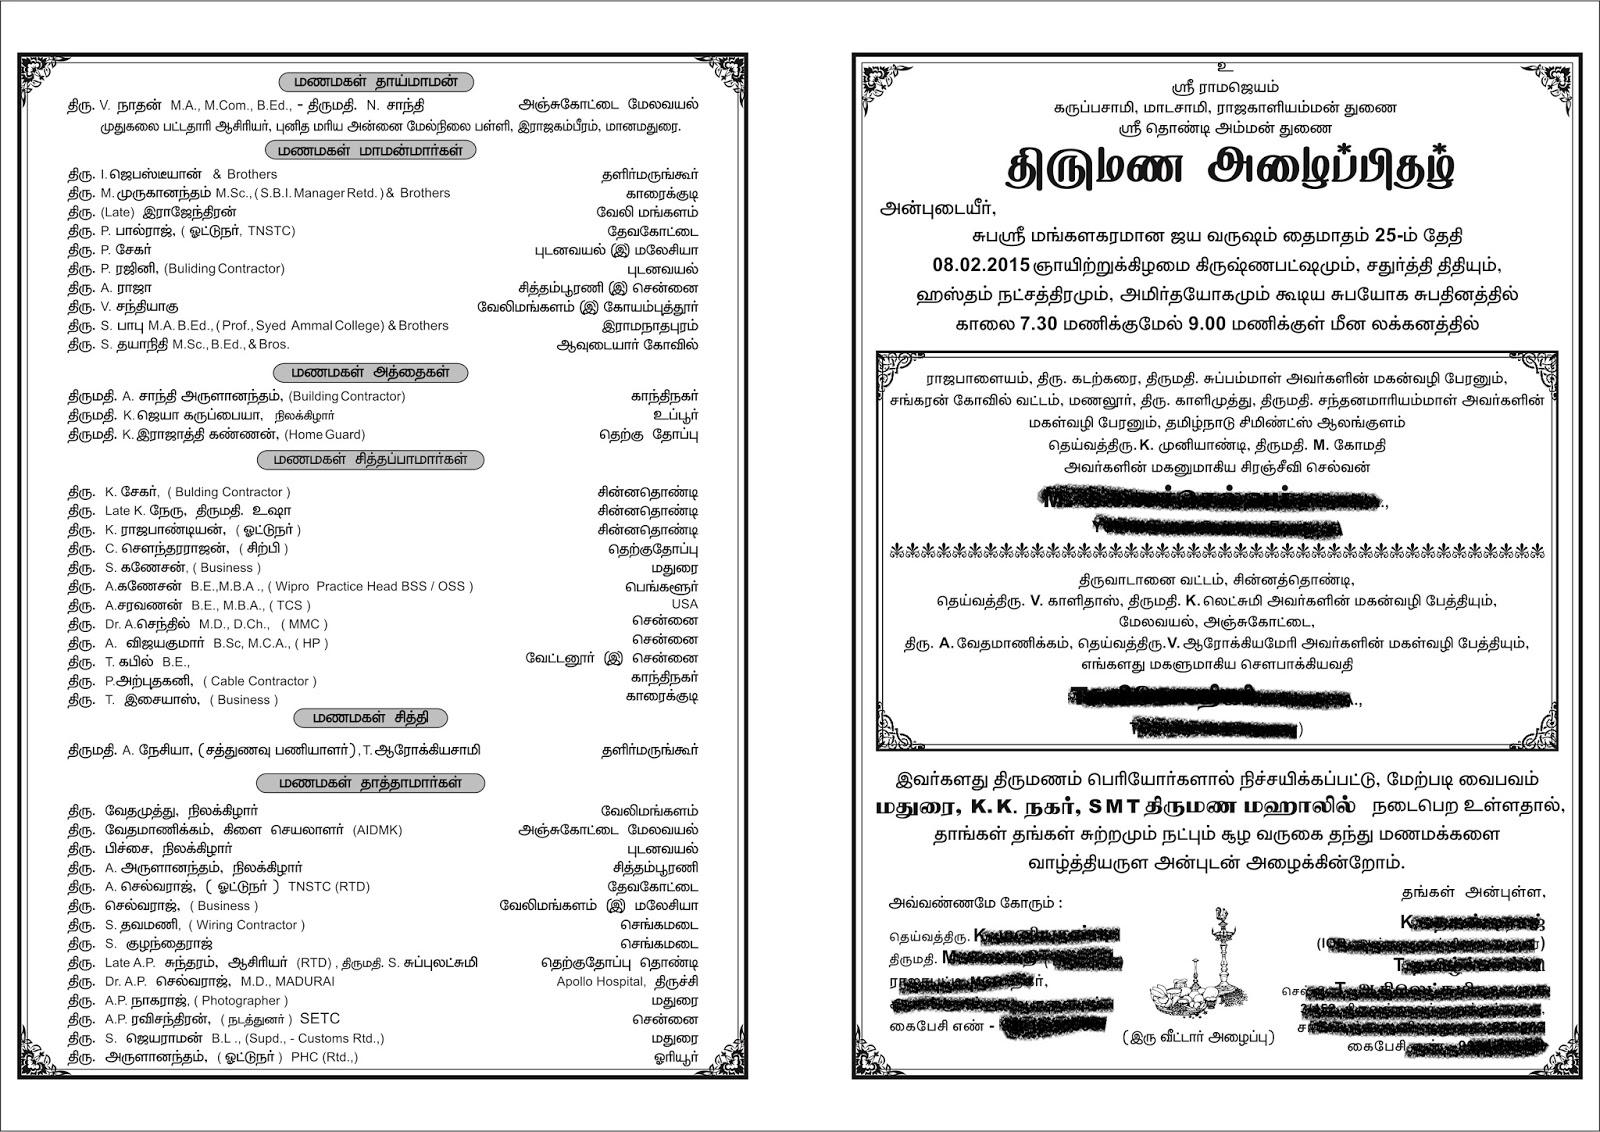 Wedding invitation samples in tamil choice image invitation invitation letter format tamil image collections invitation sashtiapthapoorthi invitation samples tamil choice image invitation letter format stopboris Gallery